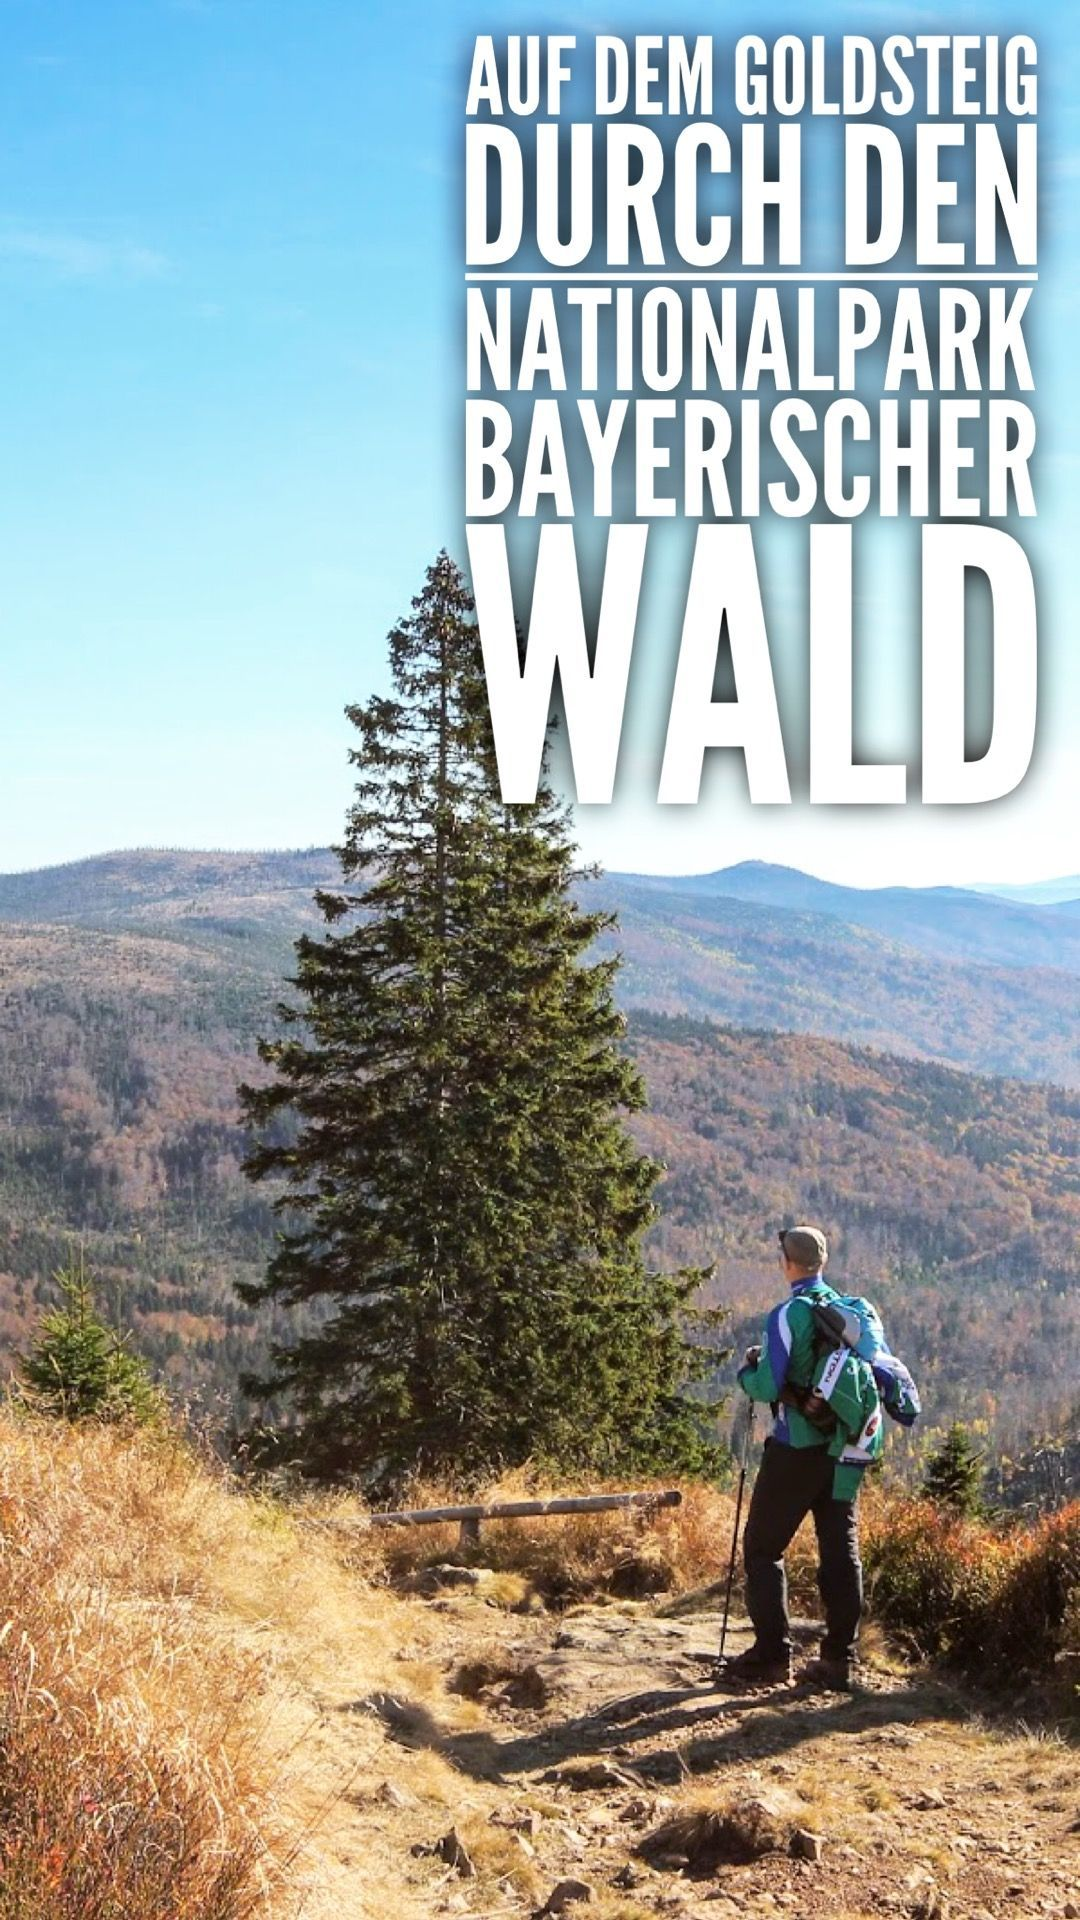 Goldsteig wandern Nationalpark Bayerischer Wald Rachel Lusen BMA #naturallandmarks